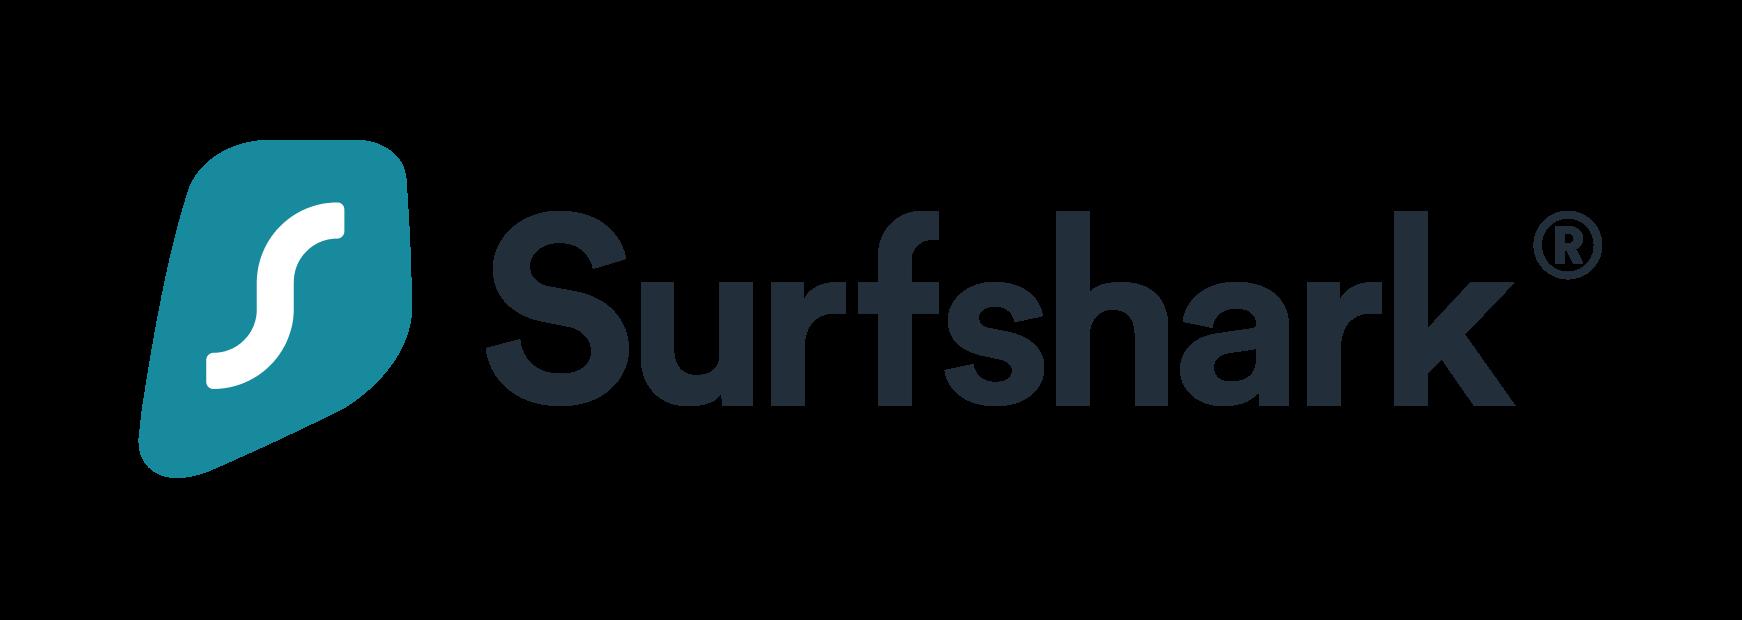 surfshark to get Australian IP address